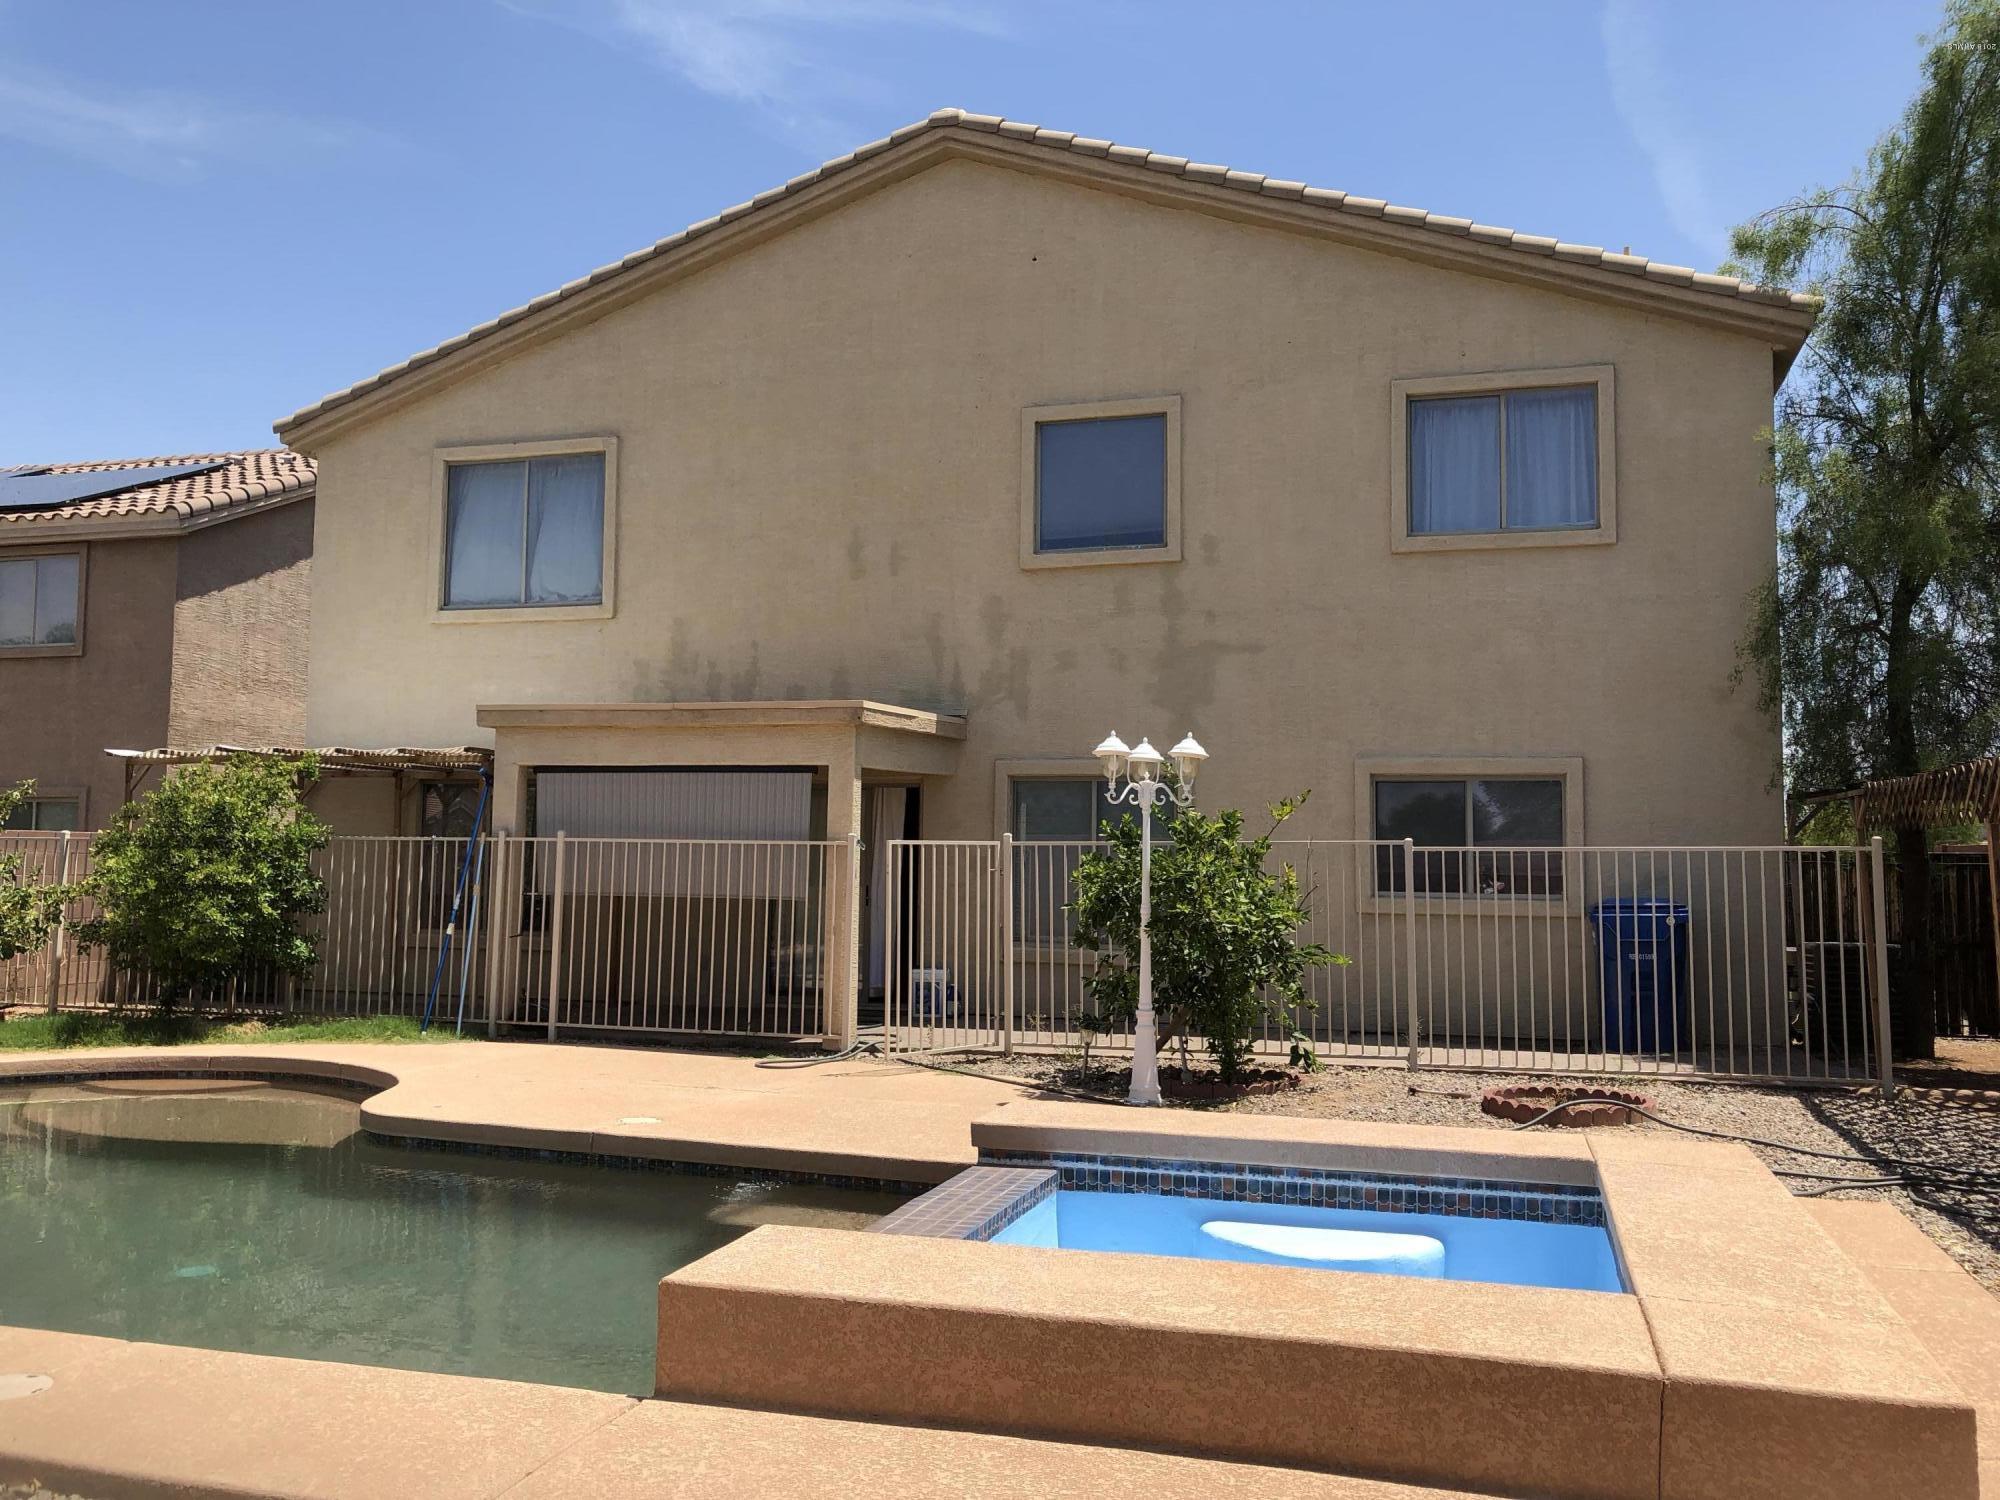 MLS 5799420 4622 N 124TH Avenue, Avondale, AZ 85392 Avondale AZ Rio Crossing